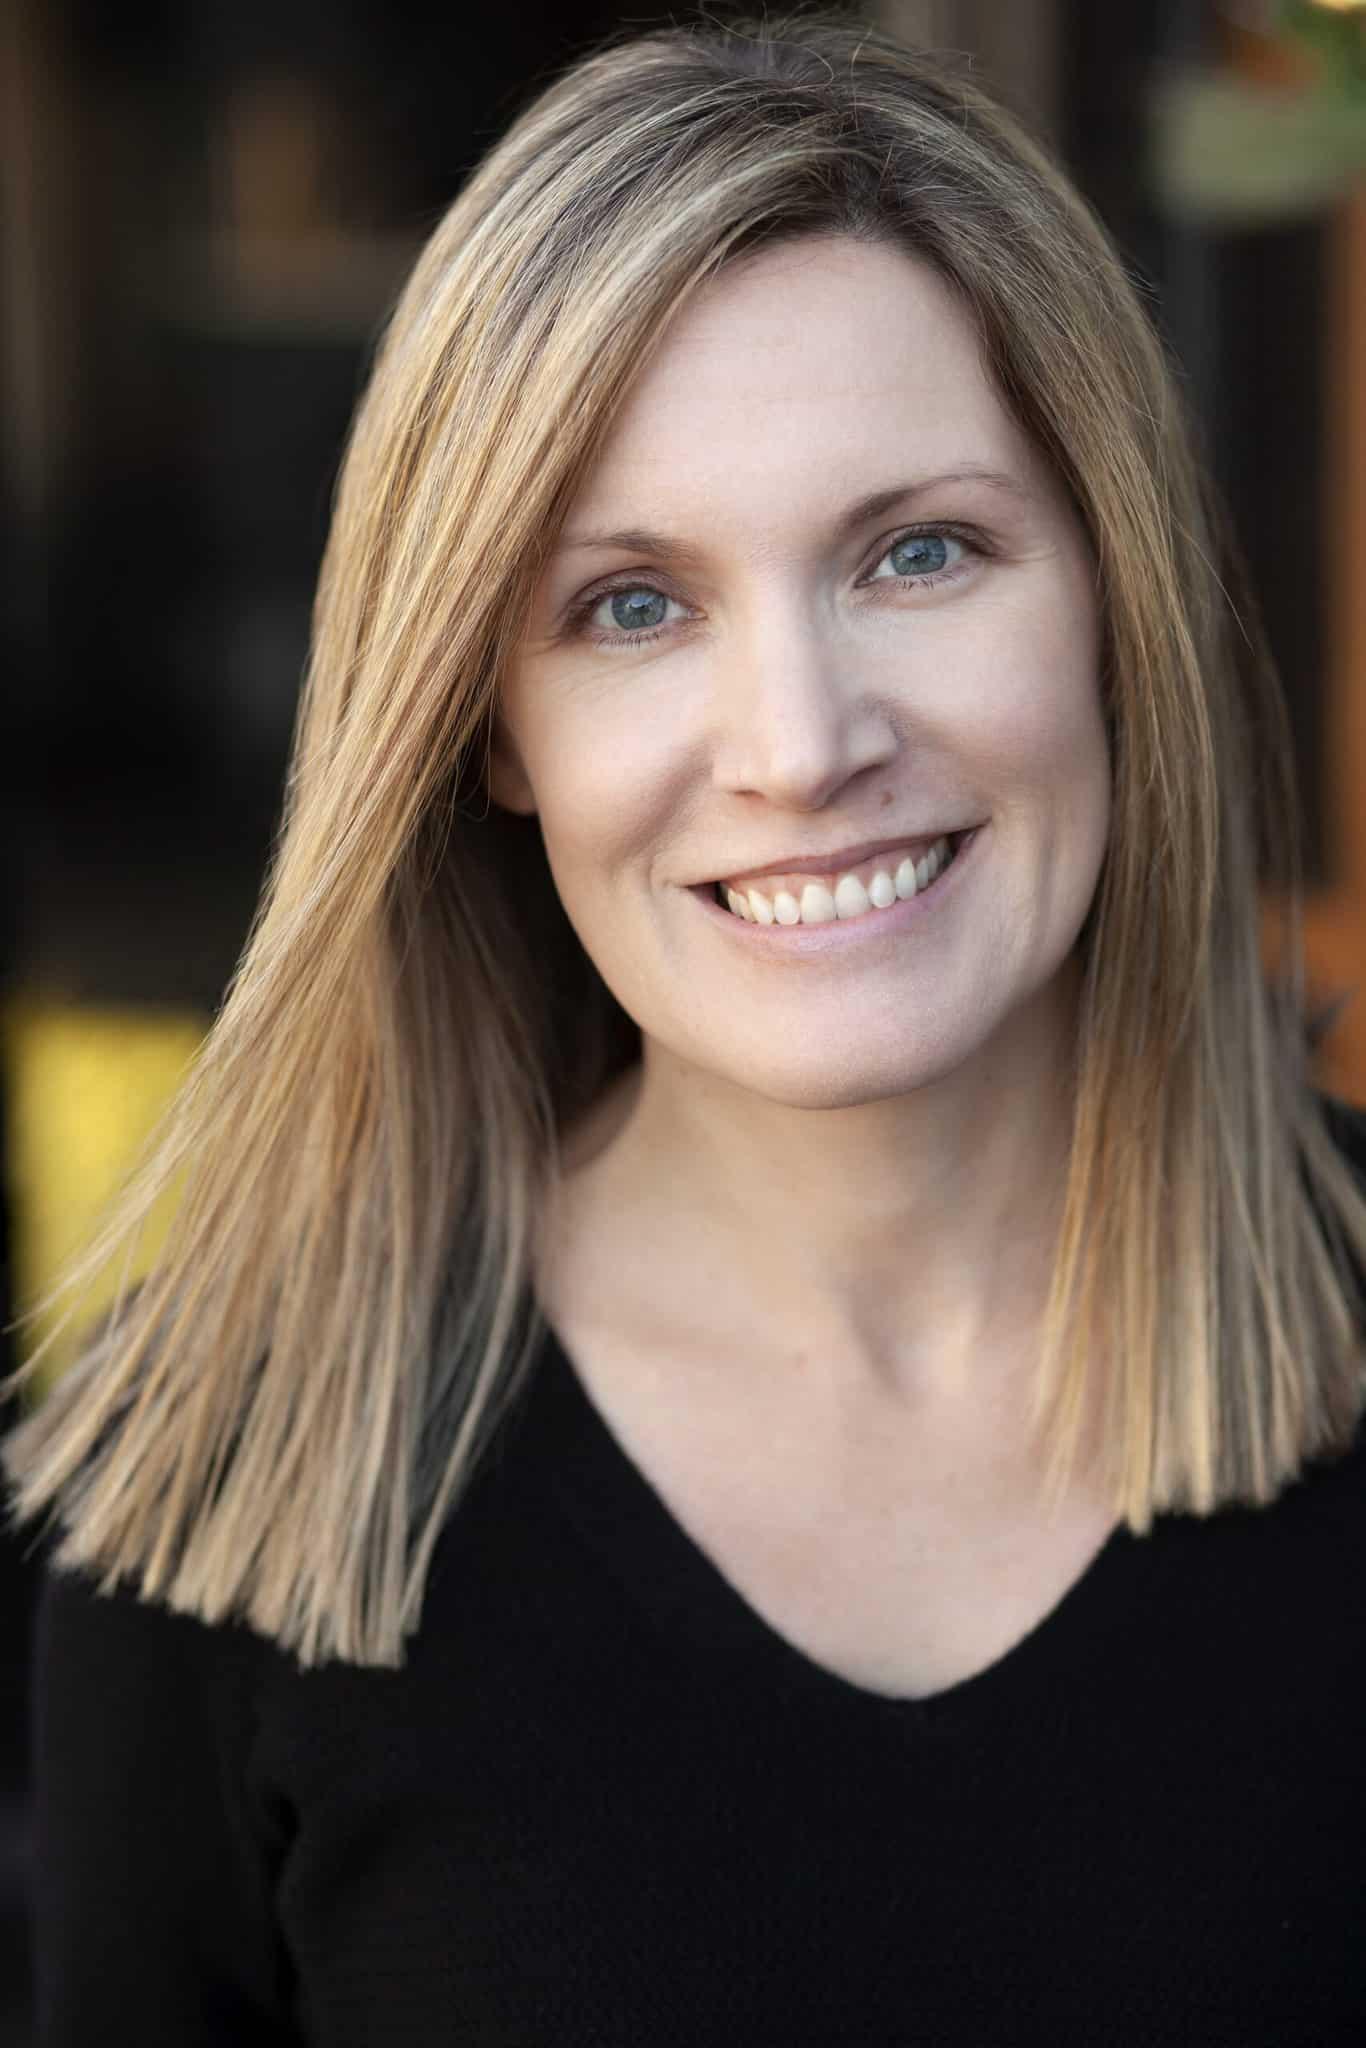 Headshot of author, Megan Miranda